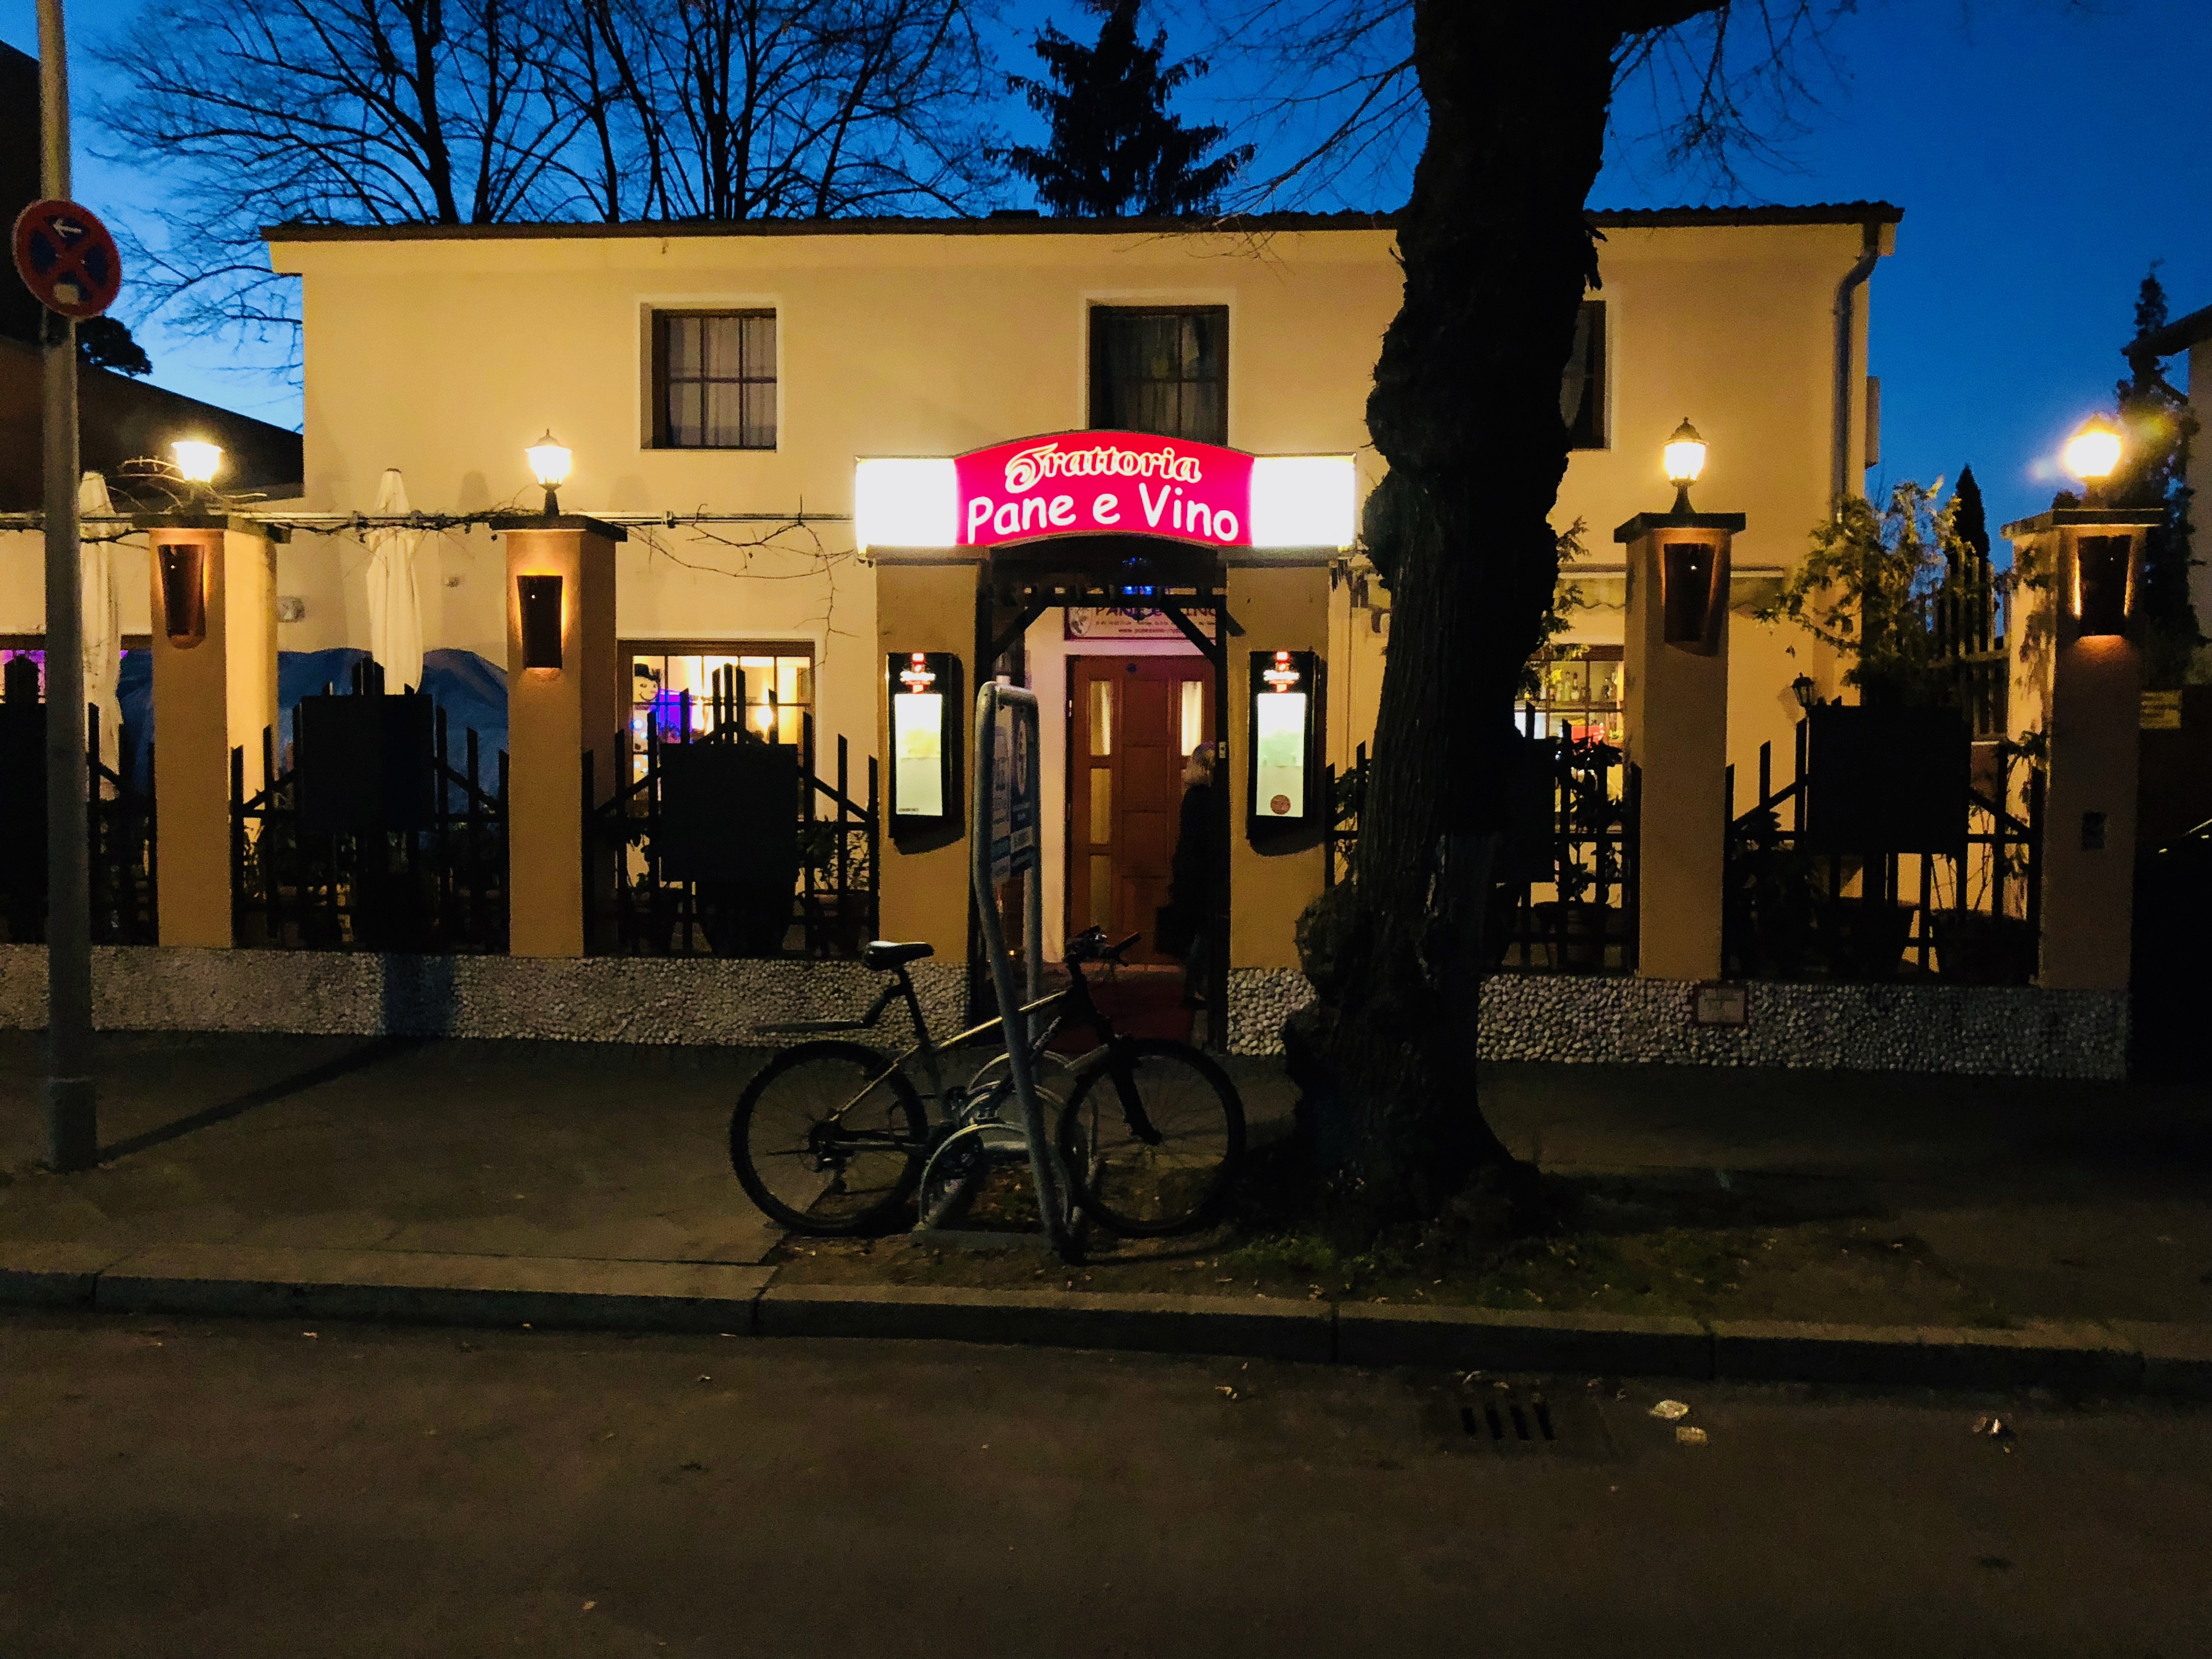 Pane e Vino restaurant in berlin at night